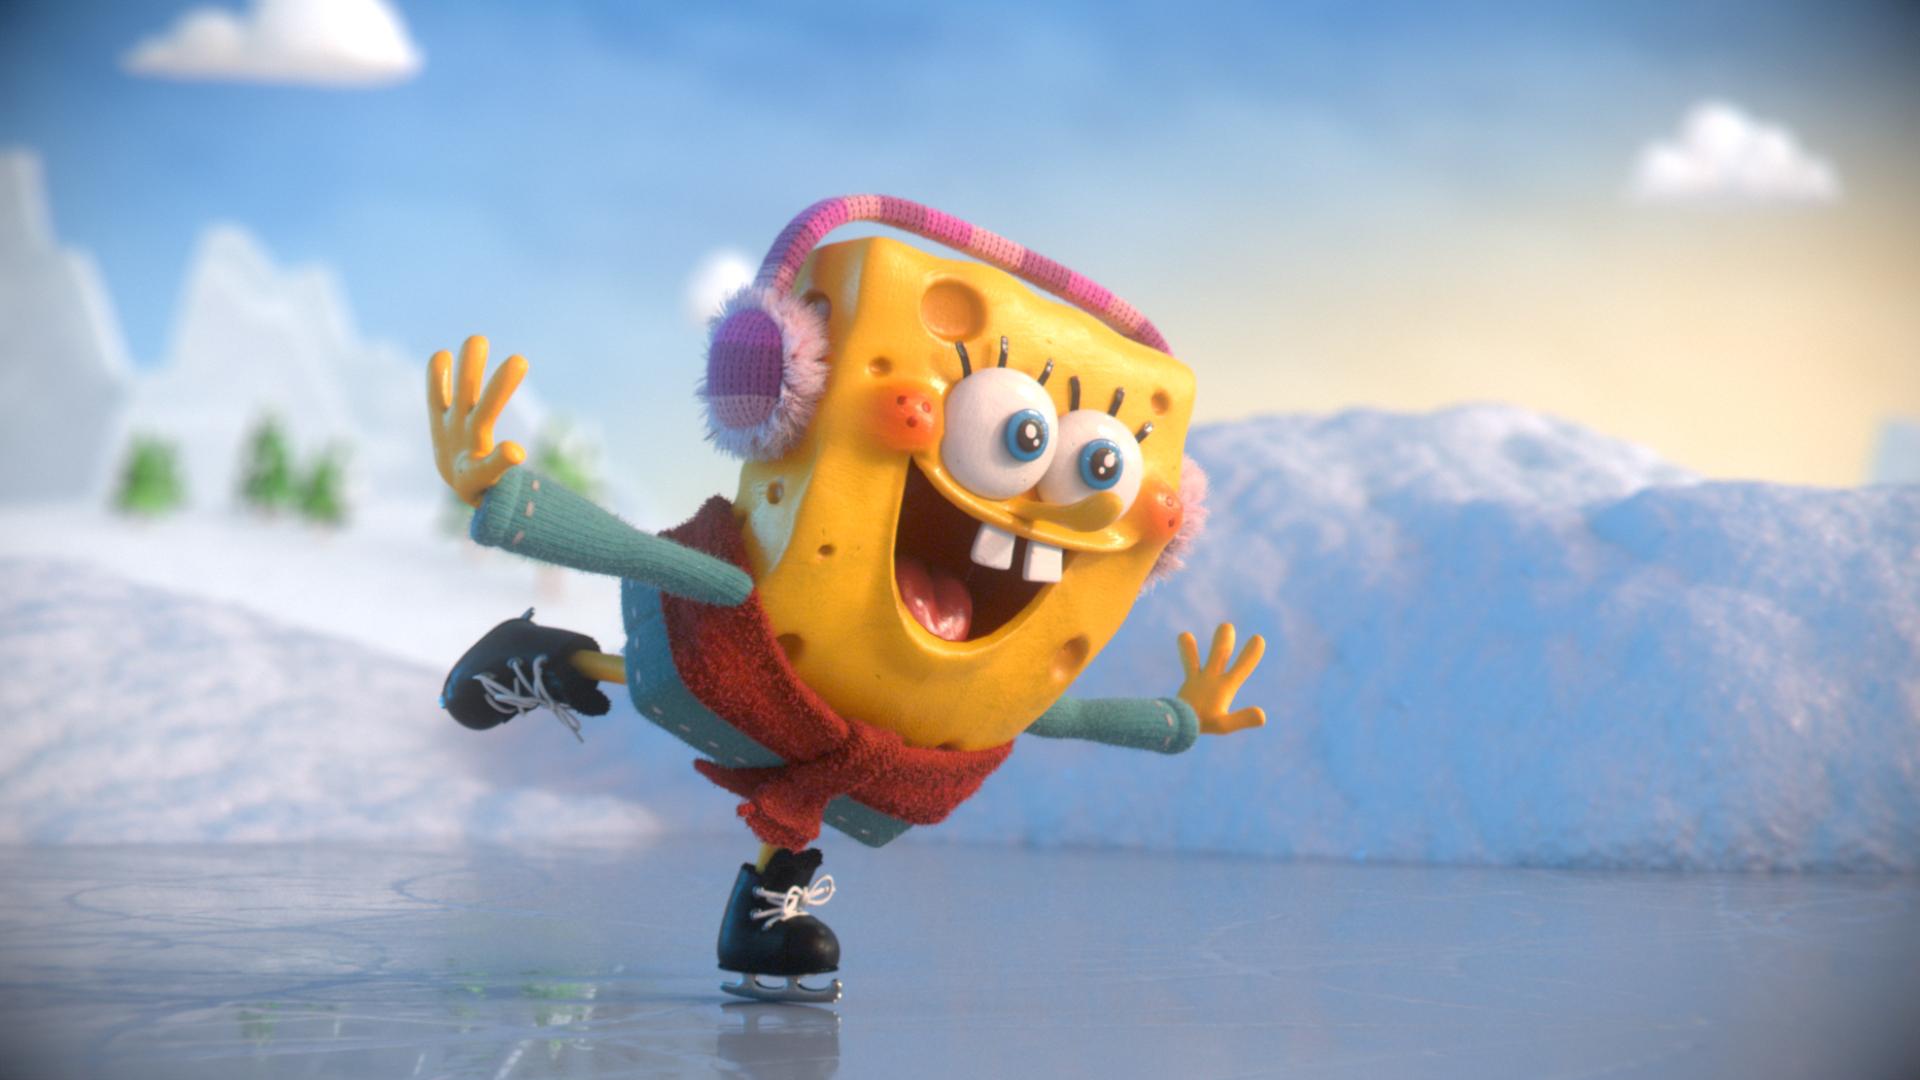 01_spongebob_onIce_v06 (0-00-00-00).png